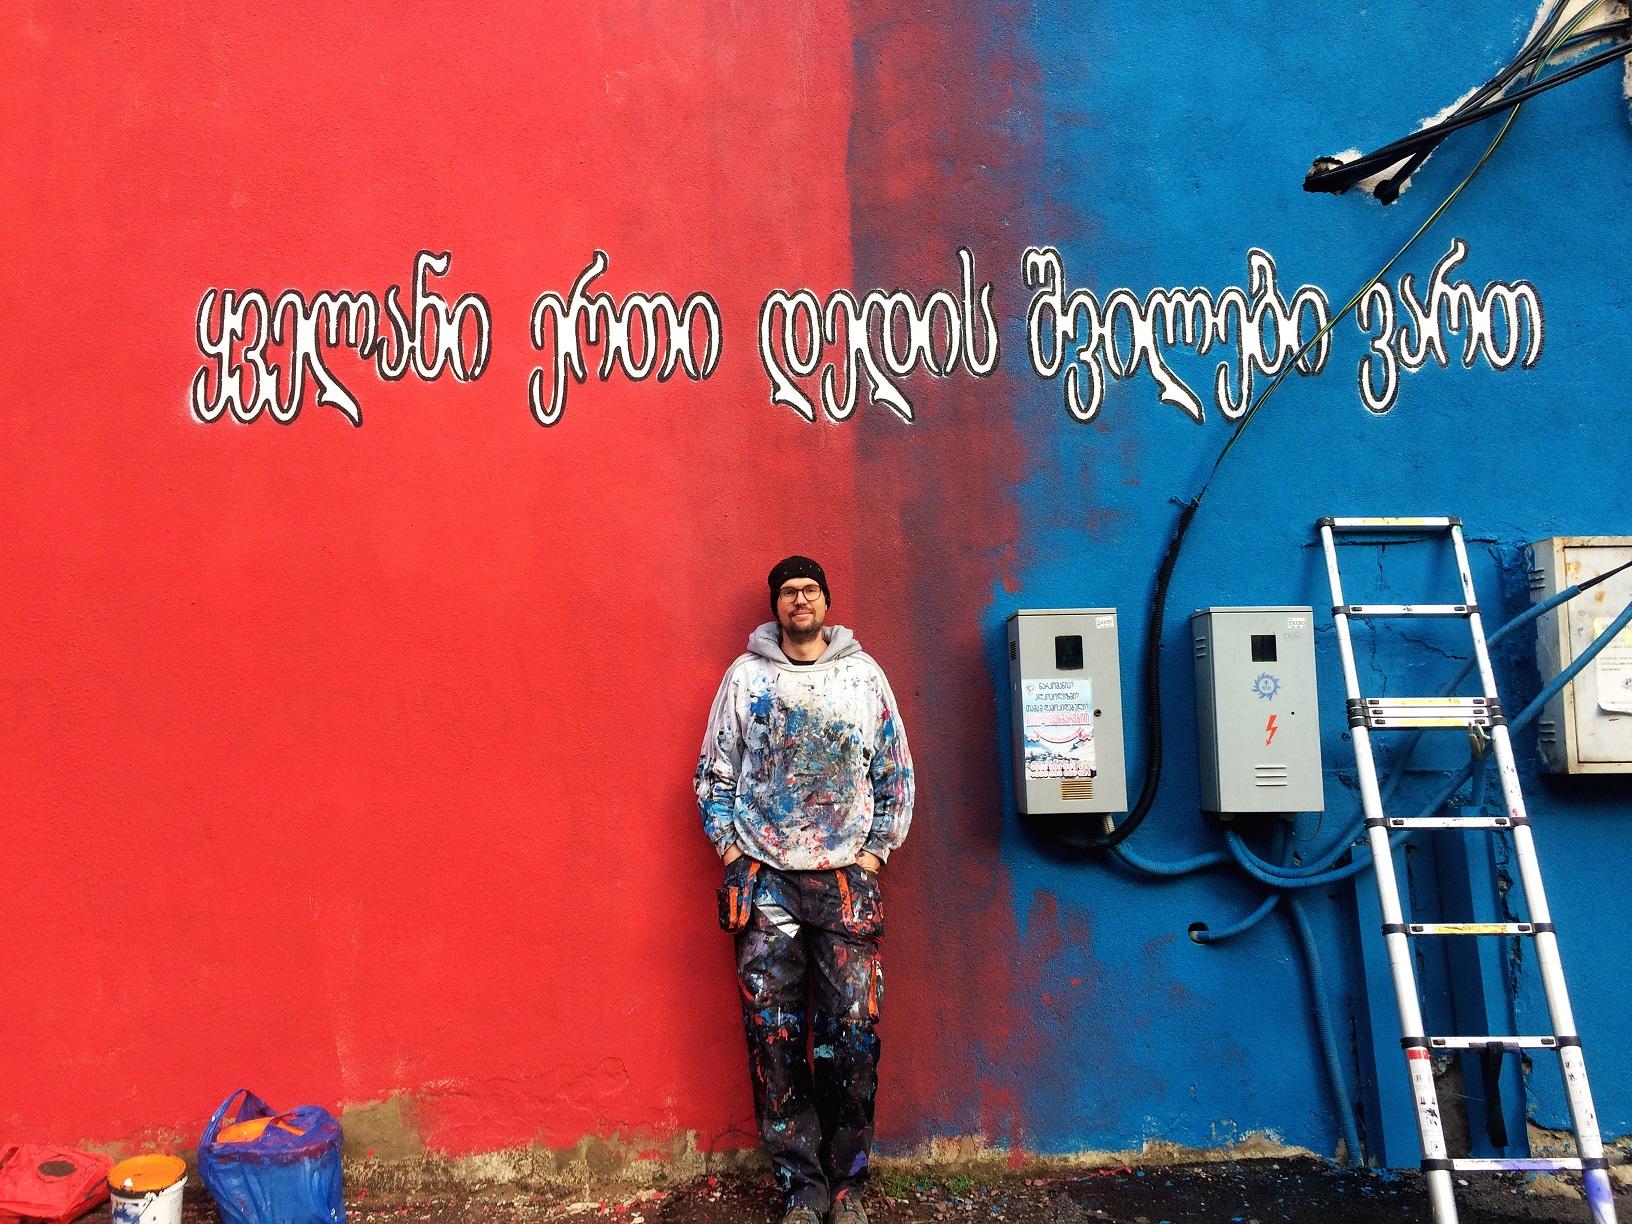 8 #art featured, арт, Бразилия, германия, граффити, Грузия, Дино Бенто, искусство, Лапиз, мурал, Саша Корбан, стрит-арт, тбилиси, украина